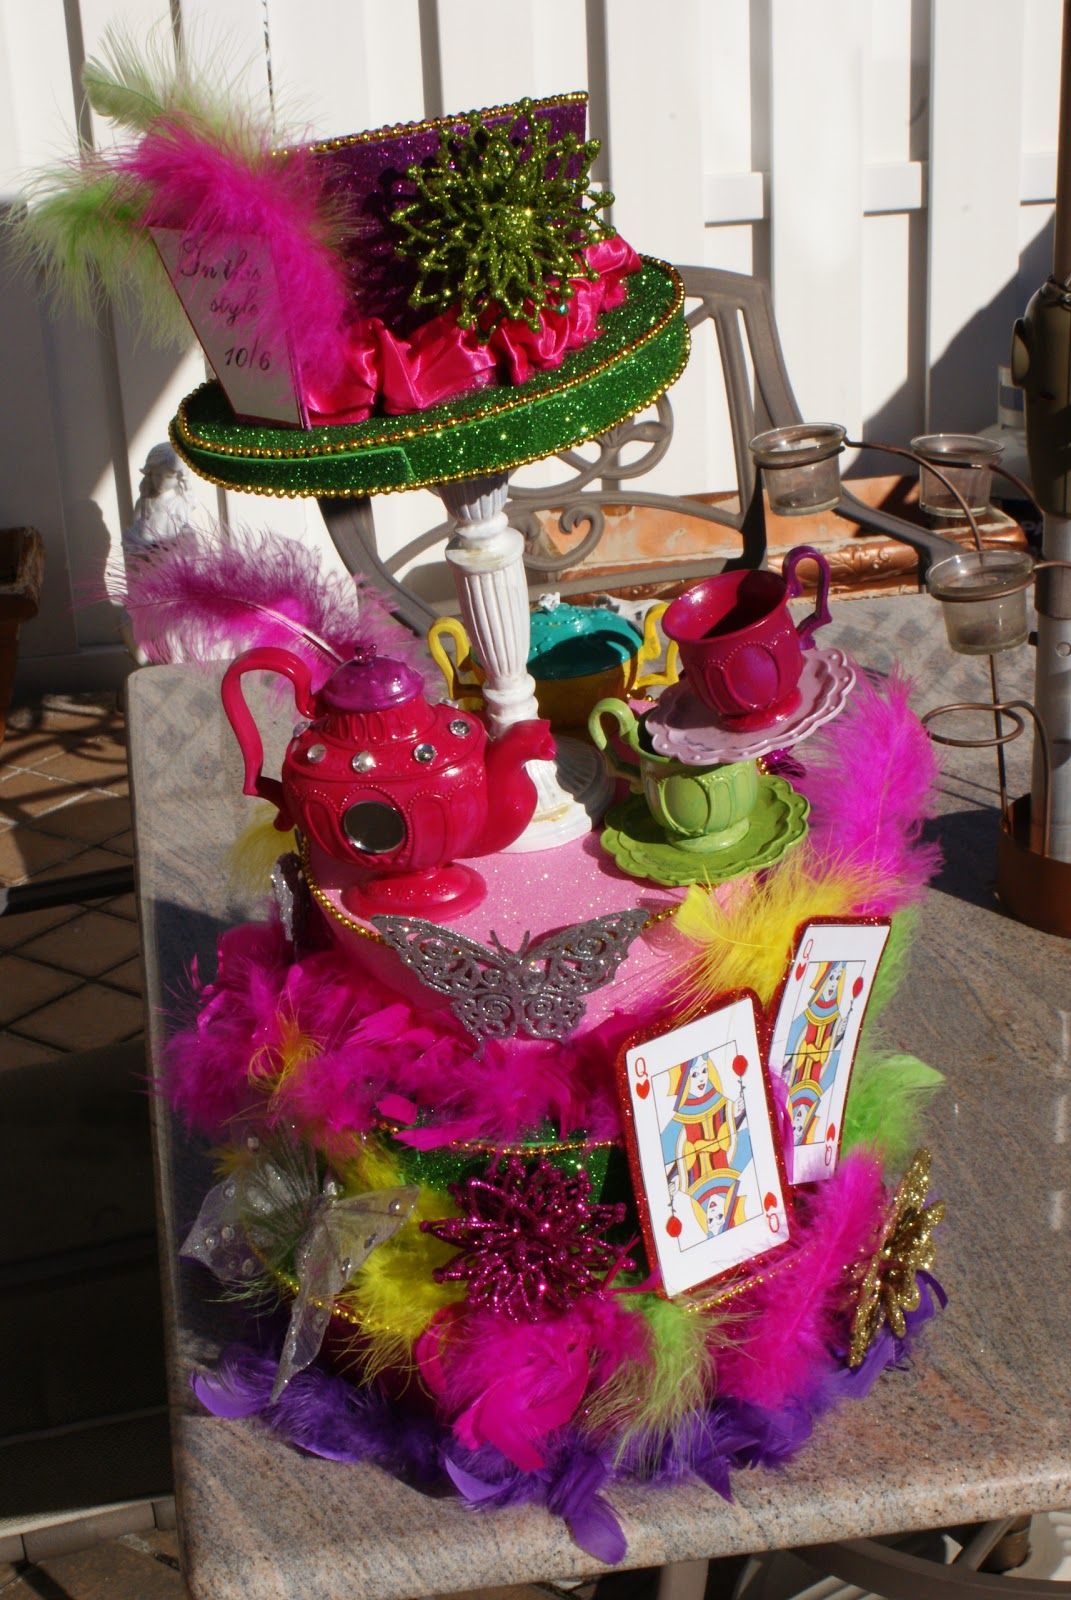 Alice In Wonderland Decorations Alice In Wonderland Party Supplies Ideas Party Supplies